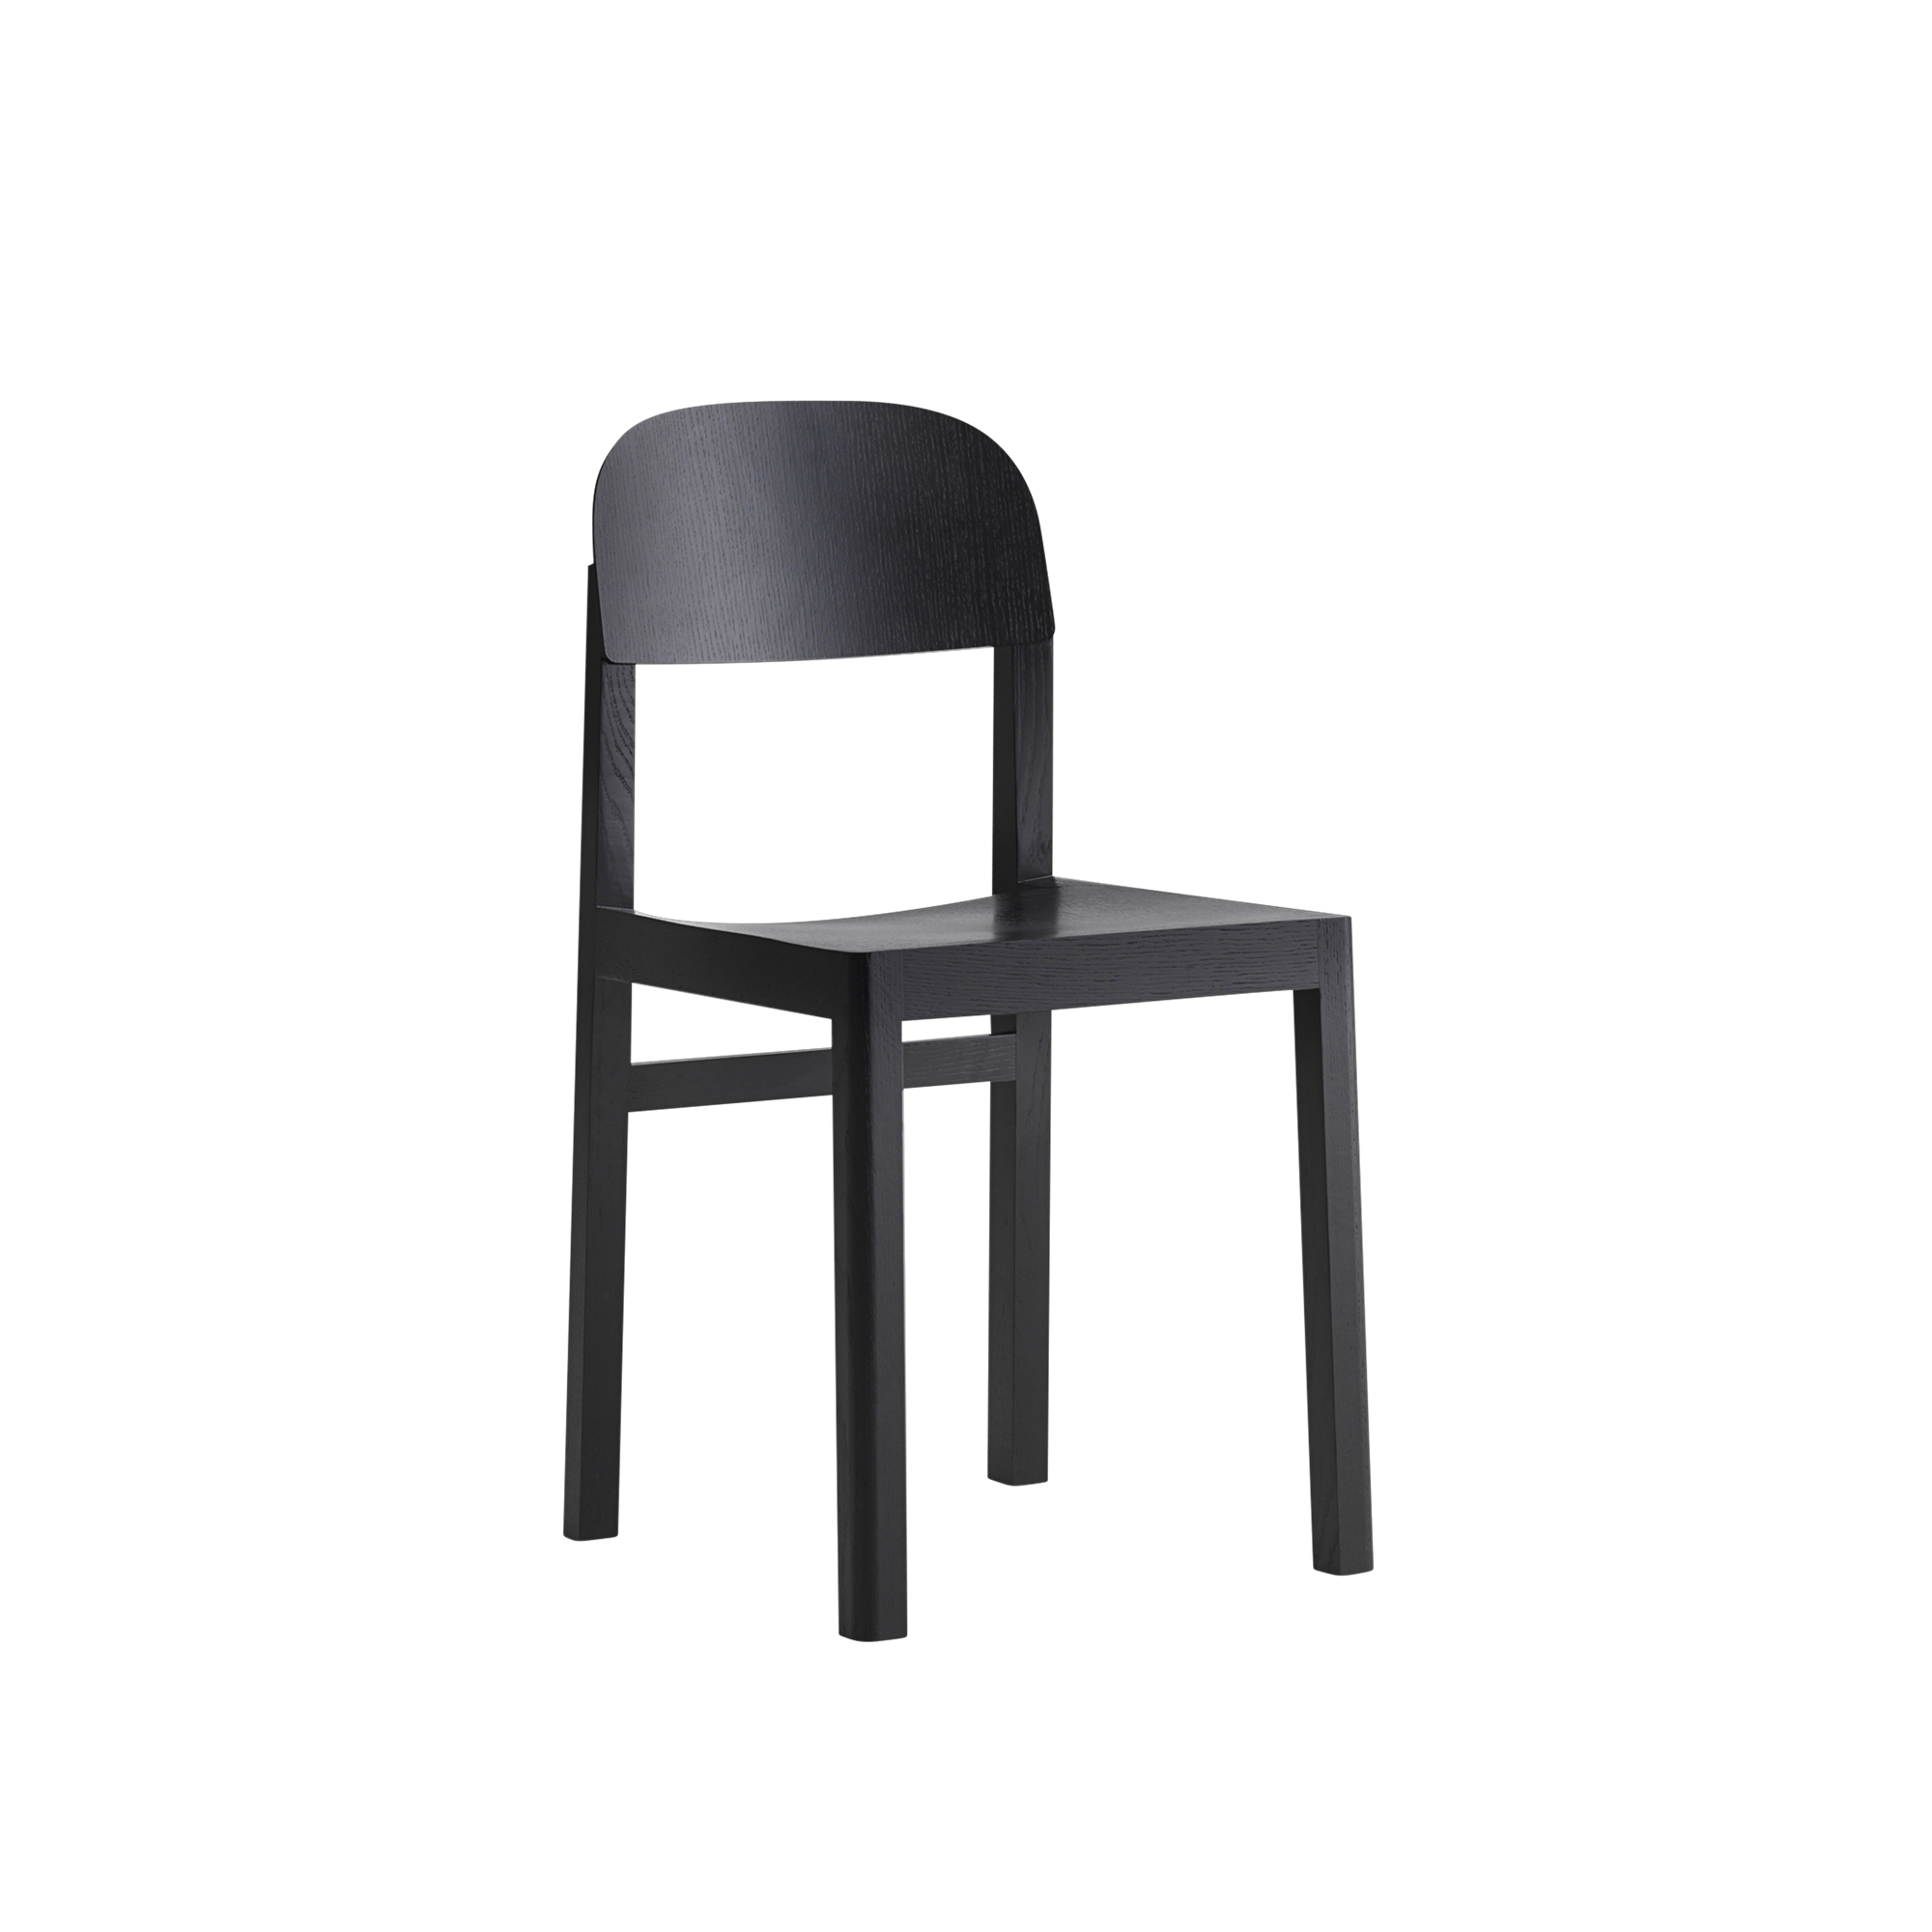 Workshop Chair Black